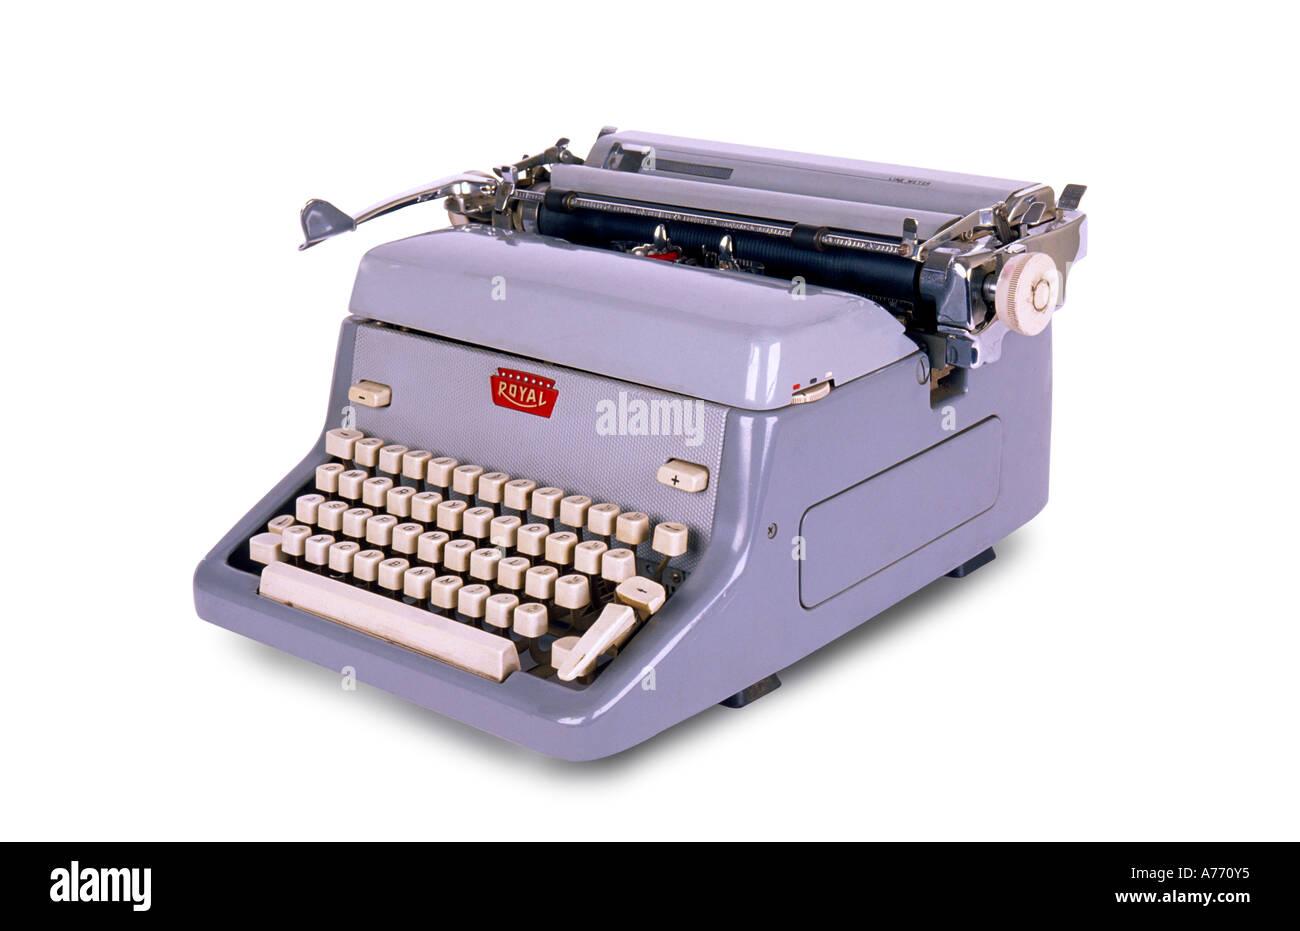 Retro grey 1950's typewriter on a pure white background. - Stock Image